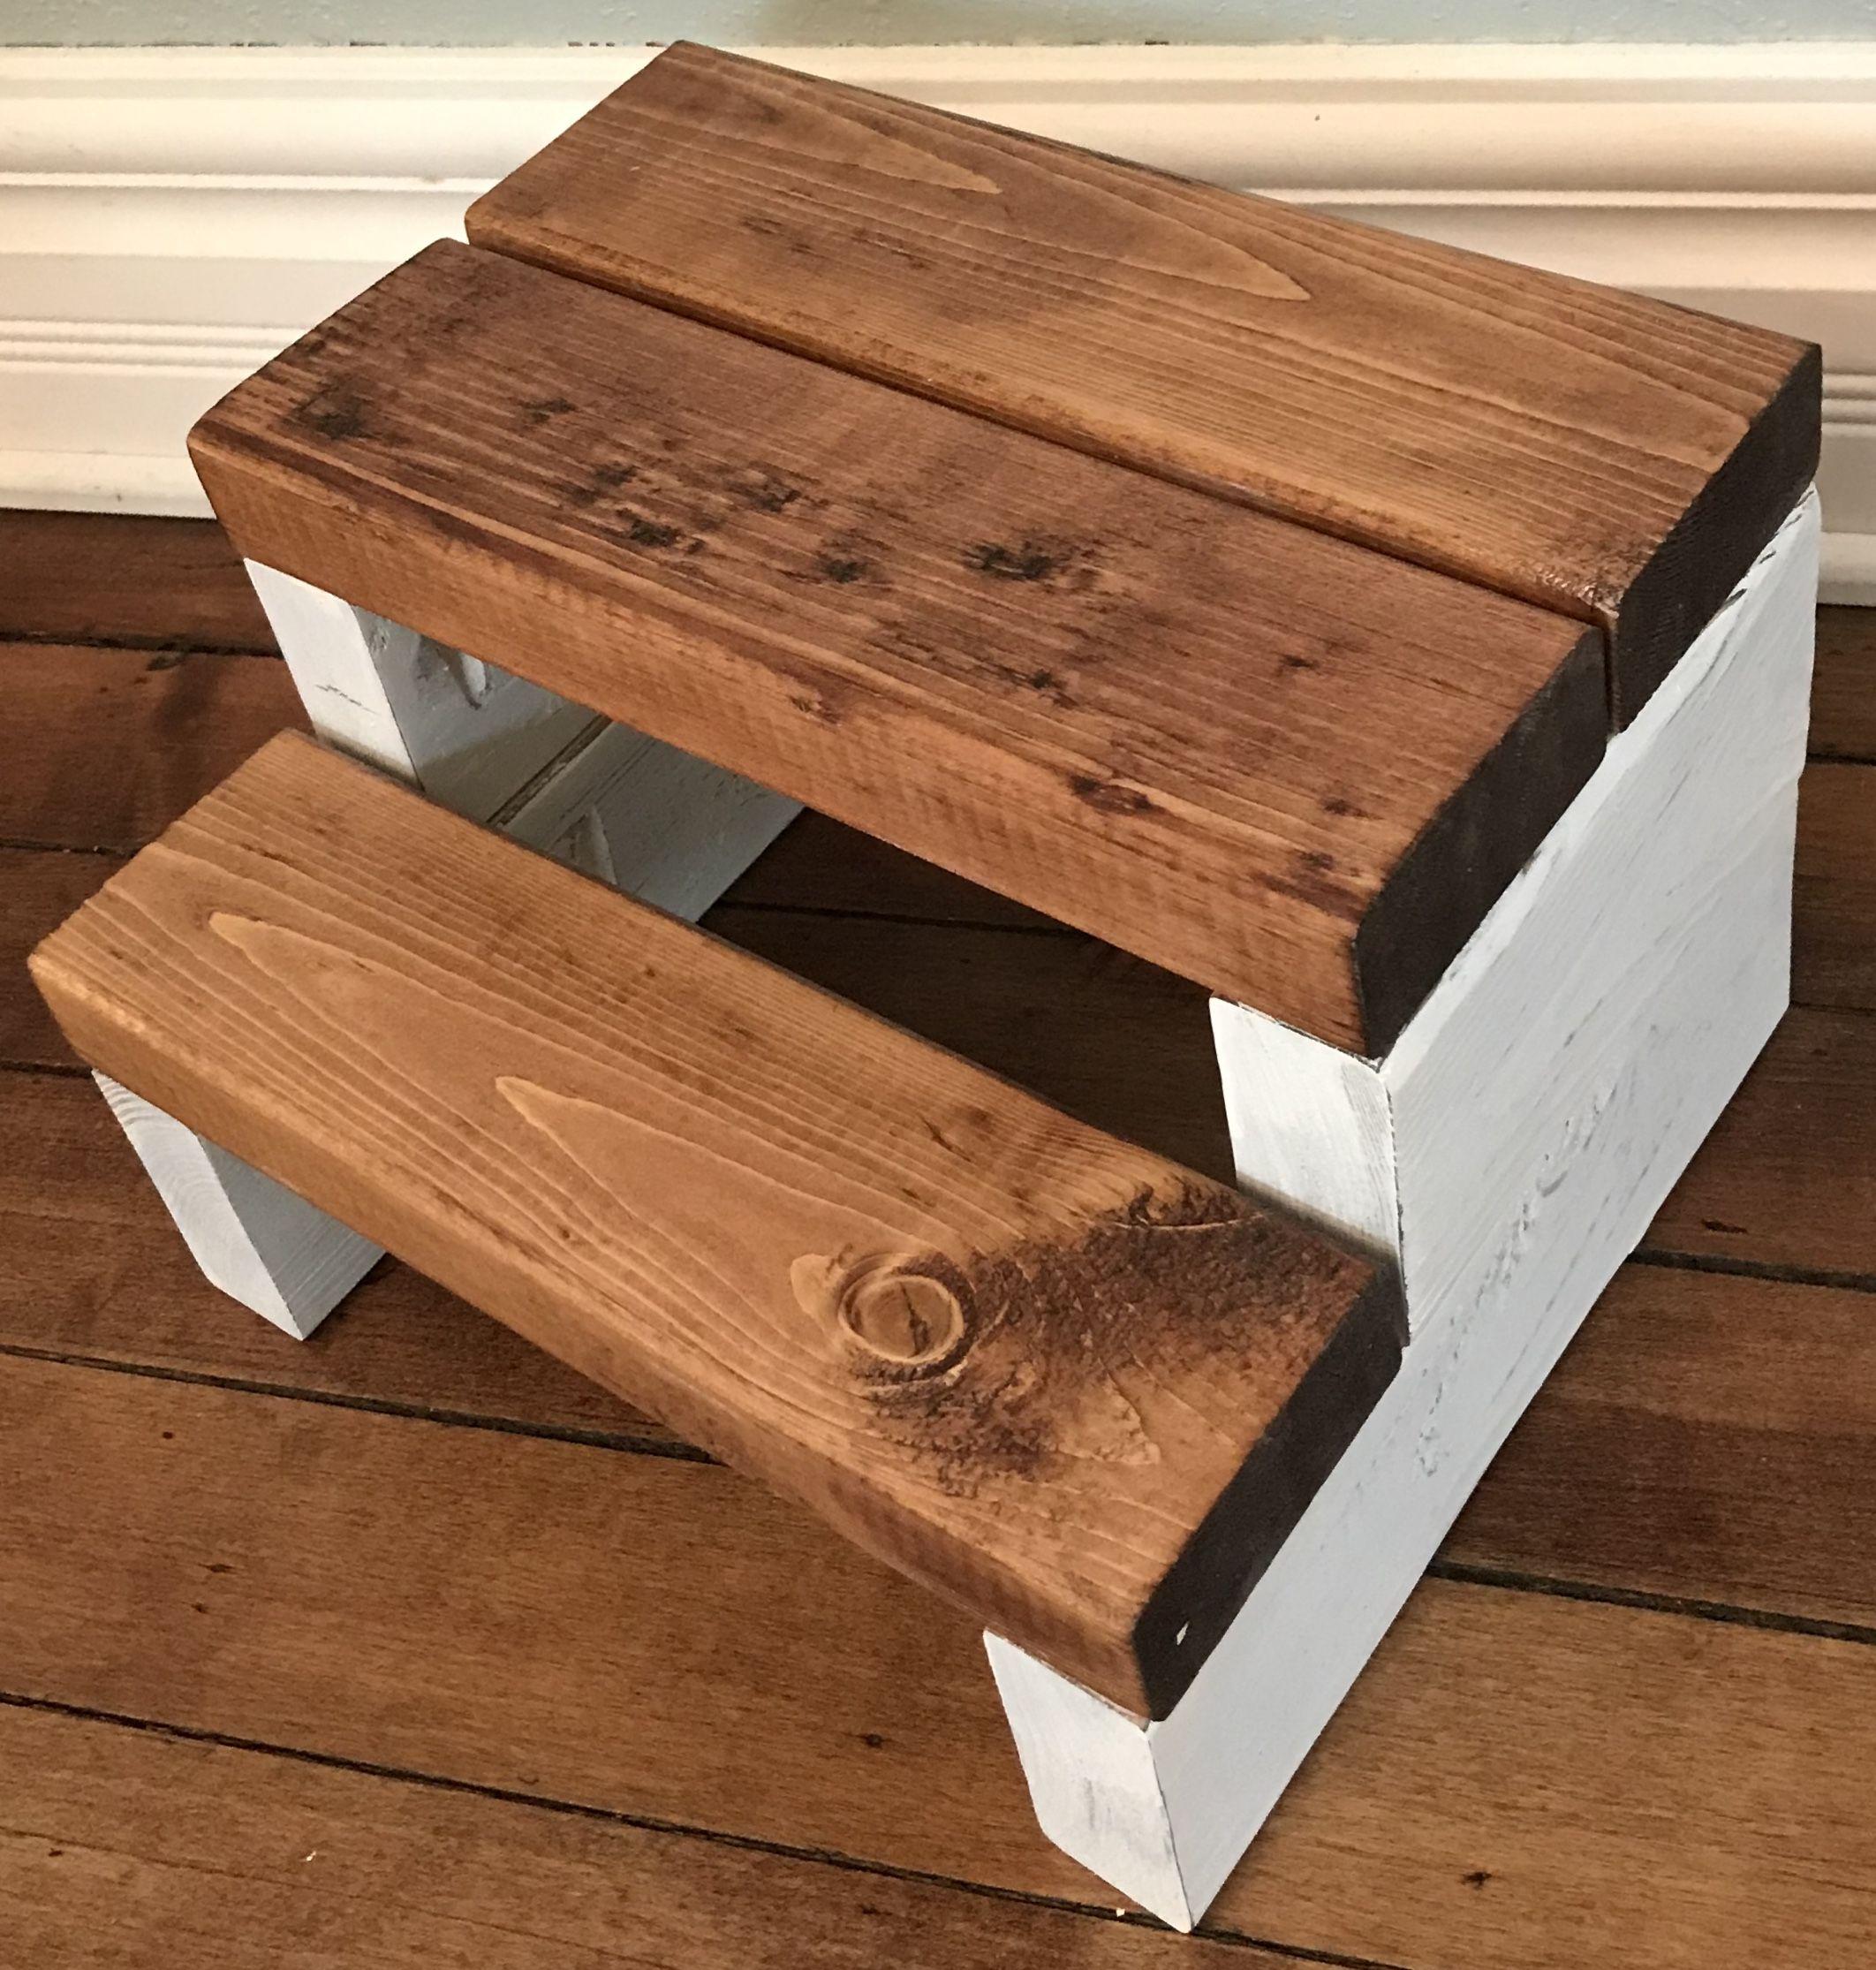 Rustic Segmented Kids Step Stool Toddler Step Stool Wooden Step